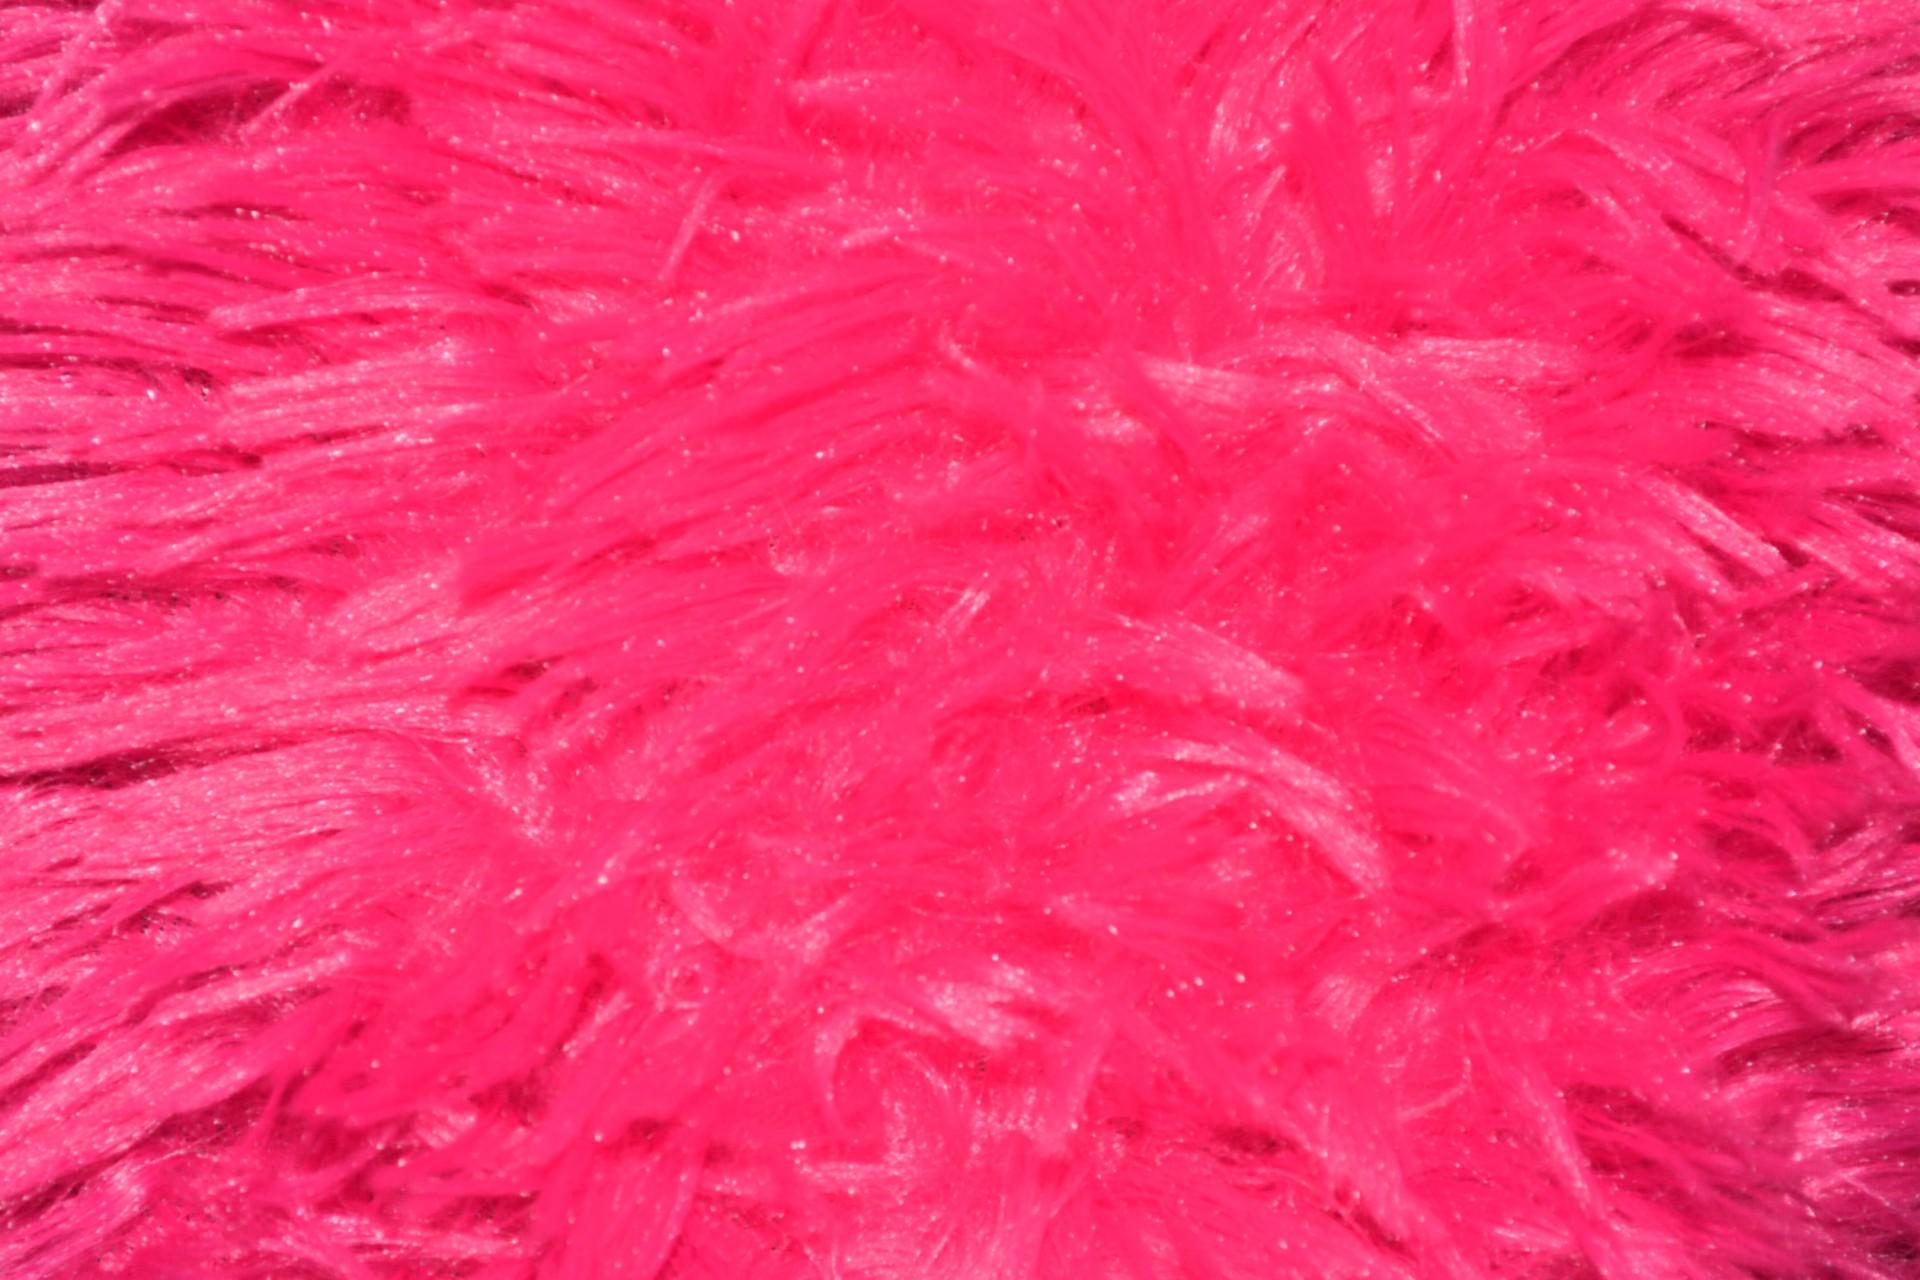 Pink Fur Colorful Background Nap Stock Photo HD   Public Domain 1920x1280